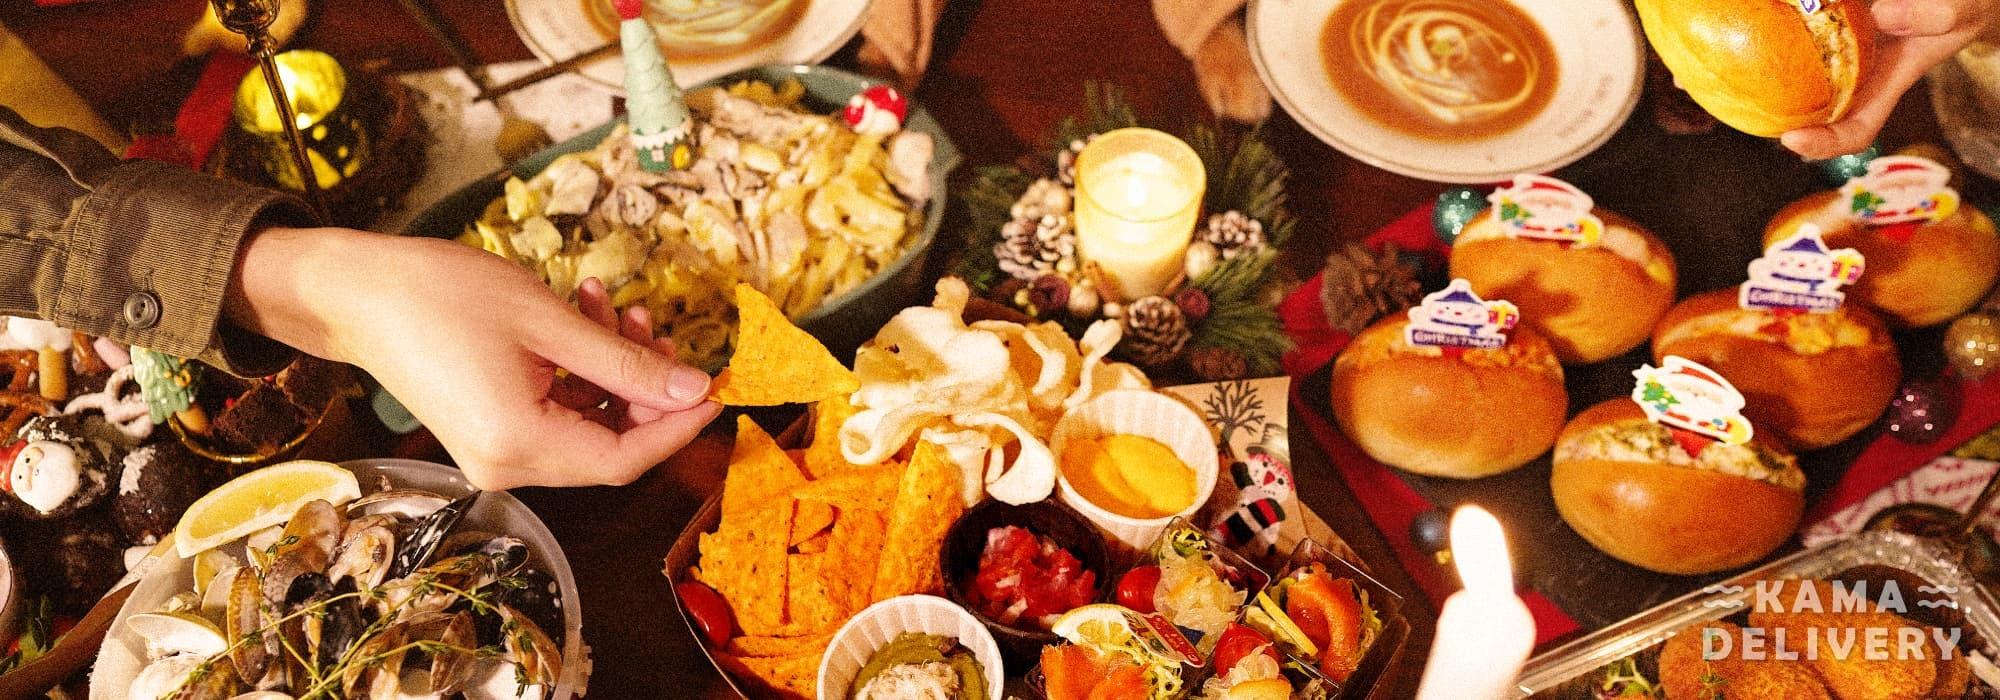 每逢節日訂到會|美食到會外賣服務推介|Kama Delivery Catering Service